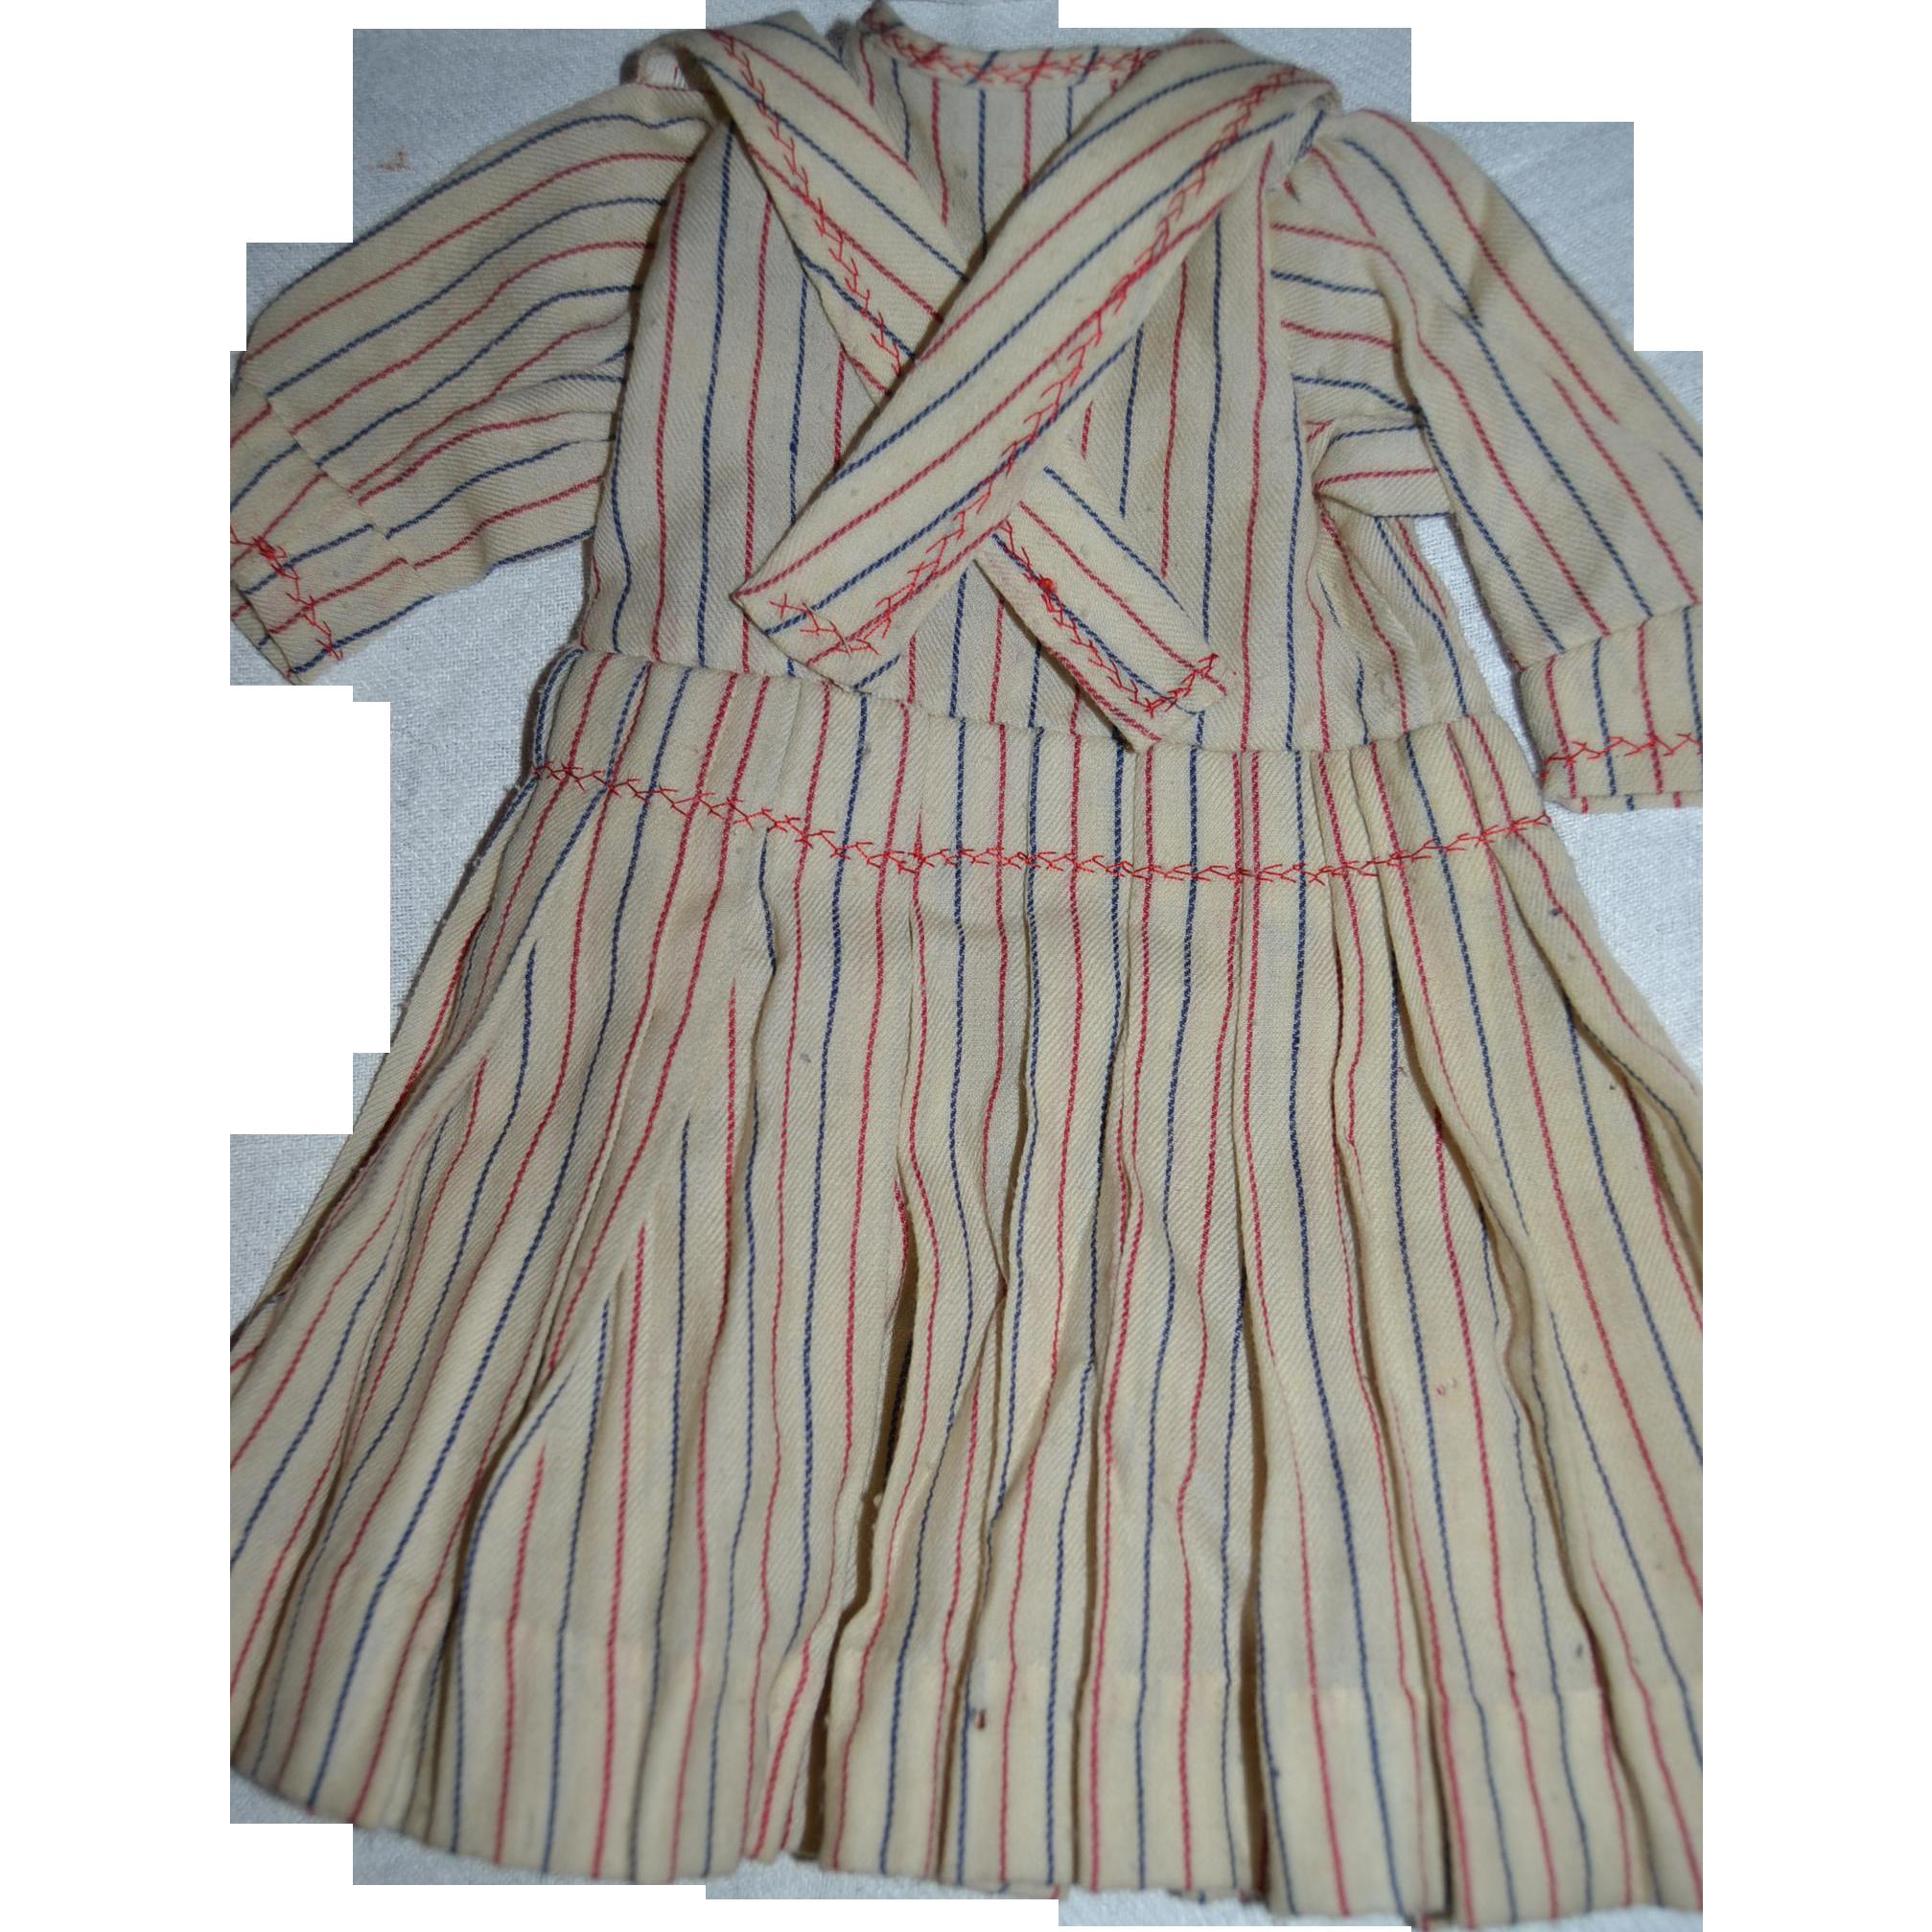 Wonderful antique French mariner style dress